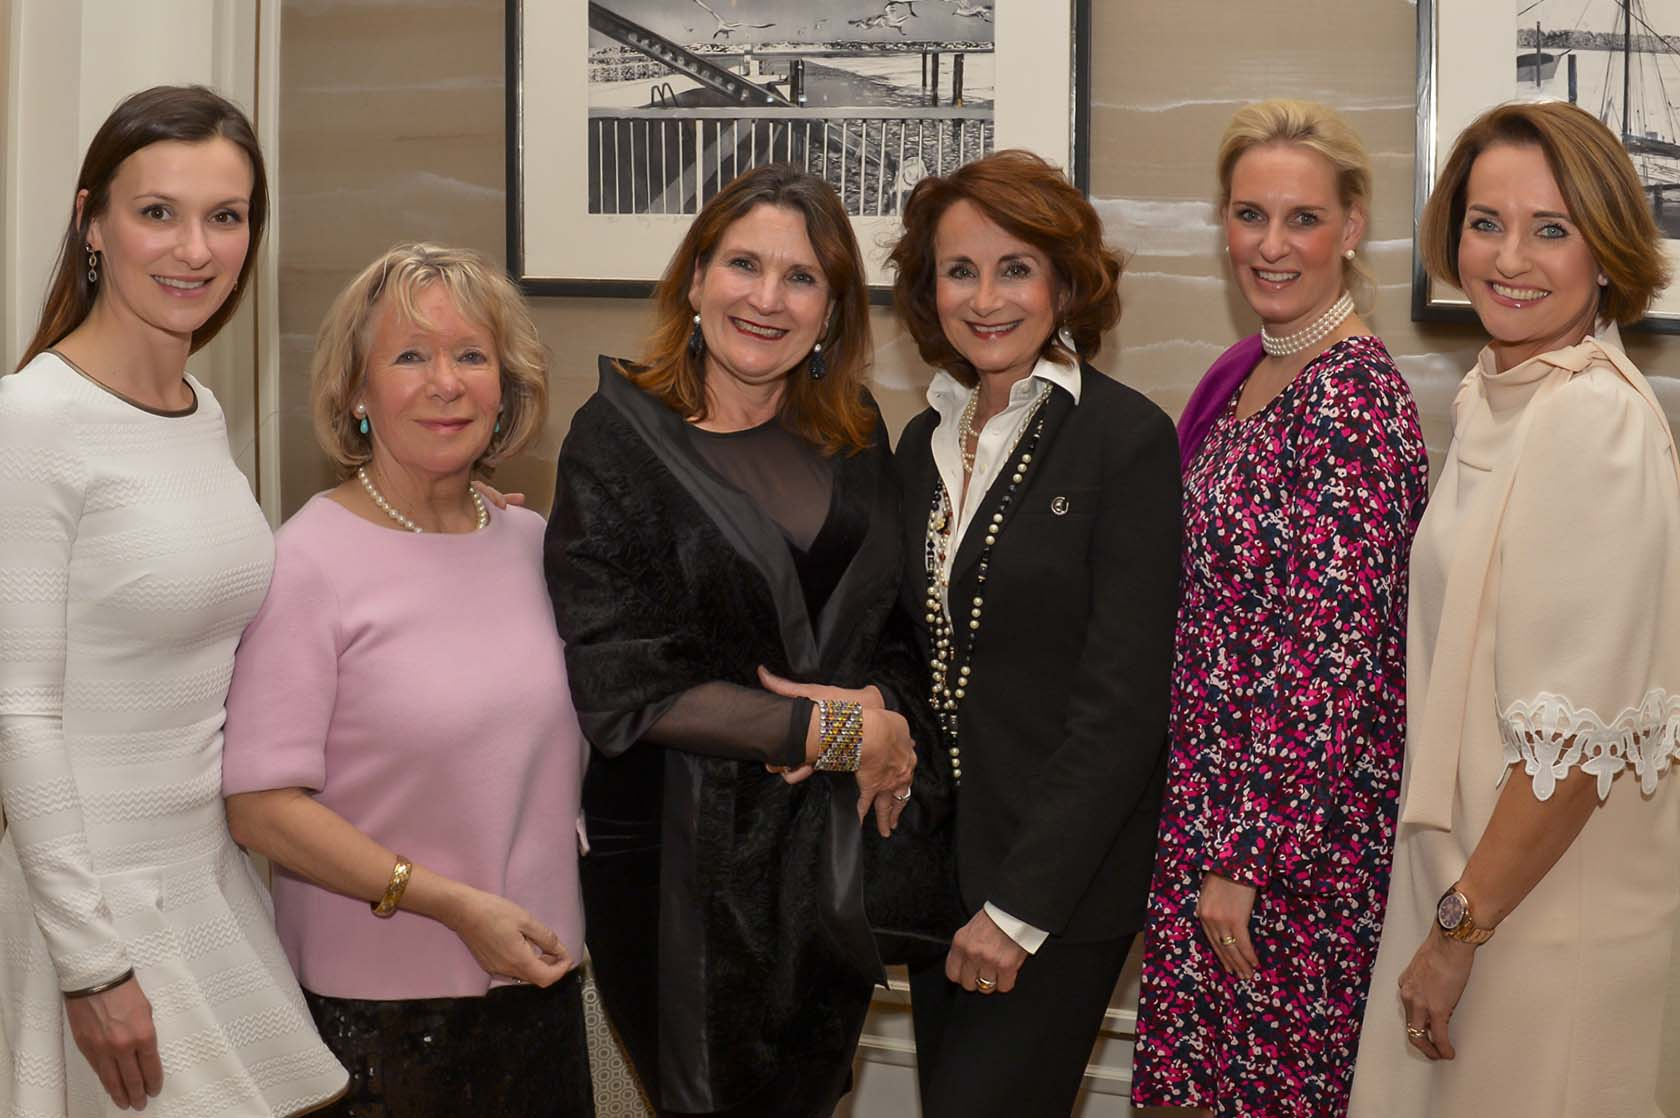 Dr. Fabienne Diekmann, Ulla Kaiser, Christiane Goetz-Weimer, Dr. Cristina Barth Frazzetta, Christiane Peters, Anita Freitag-Meyer